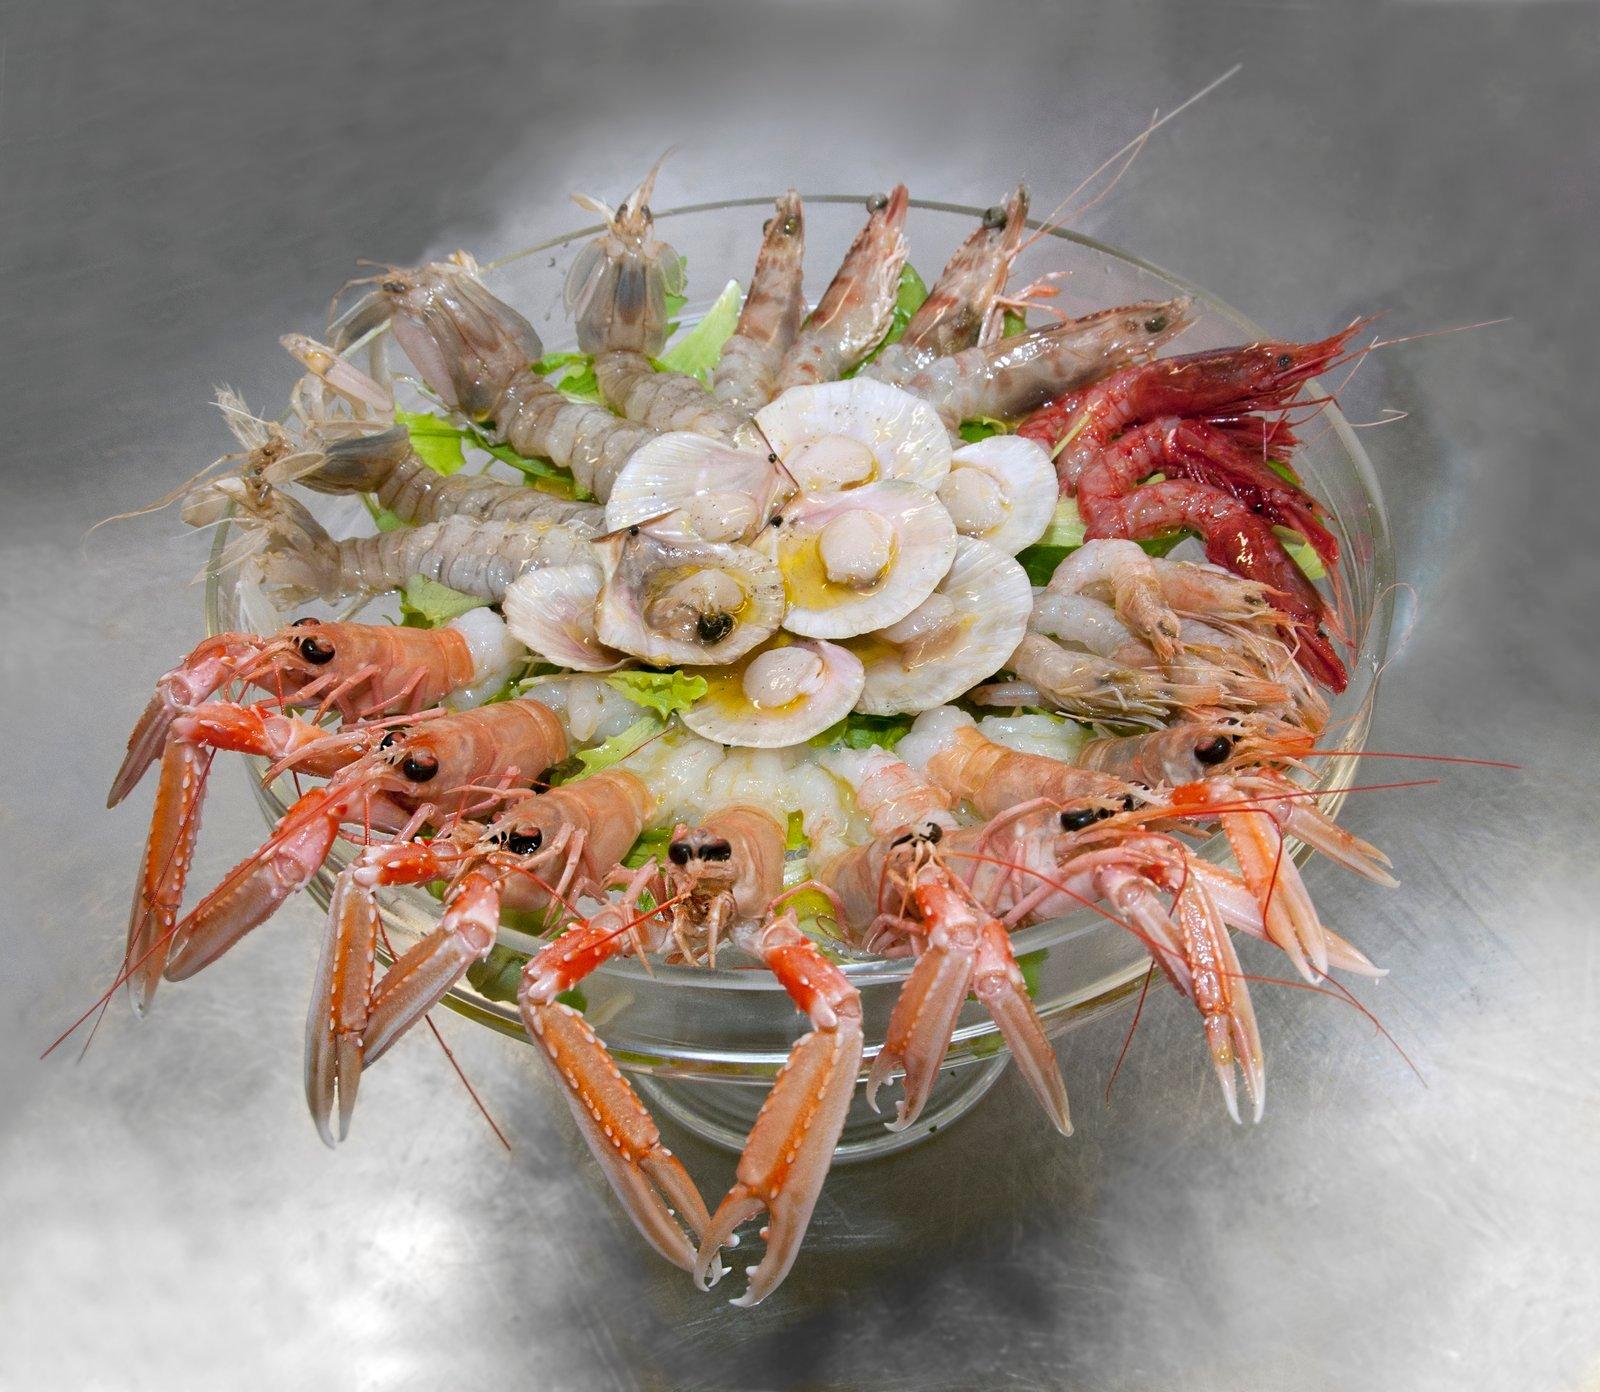 Province of Padua, Italy Food Guide: 10 Seafood food Must-Eat Restaurants & Street Food Stalls in Noventa Padovana